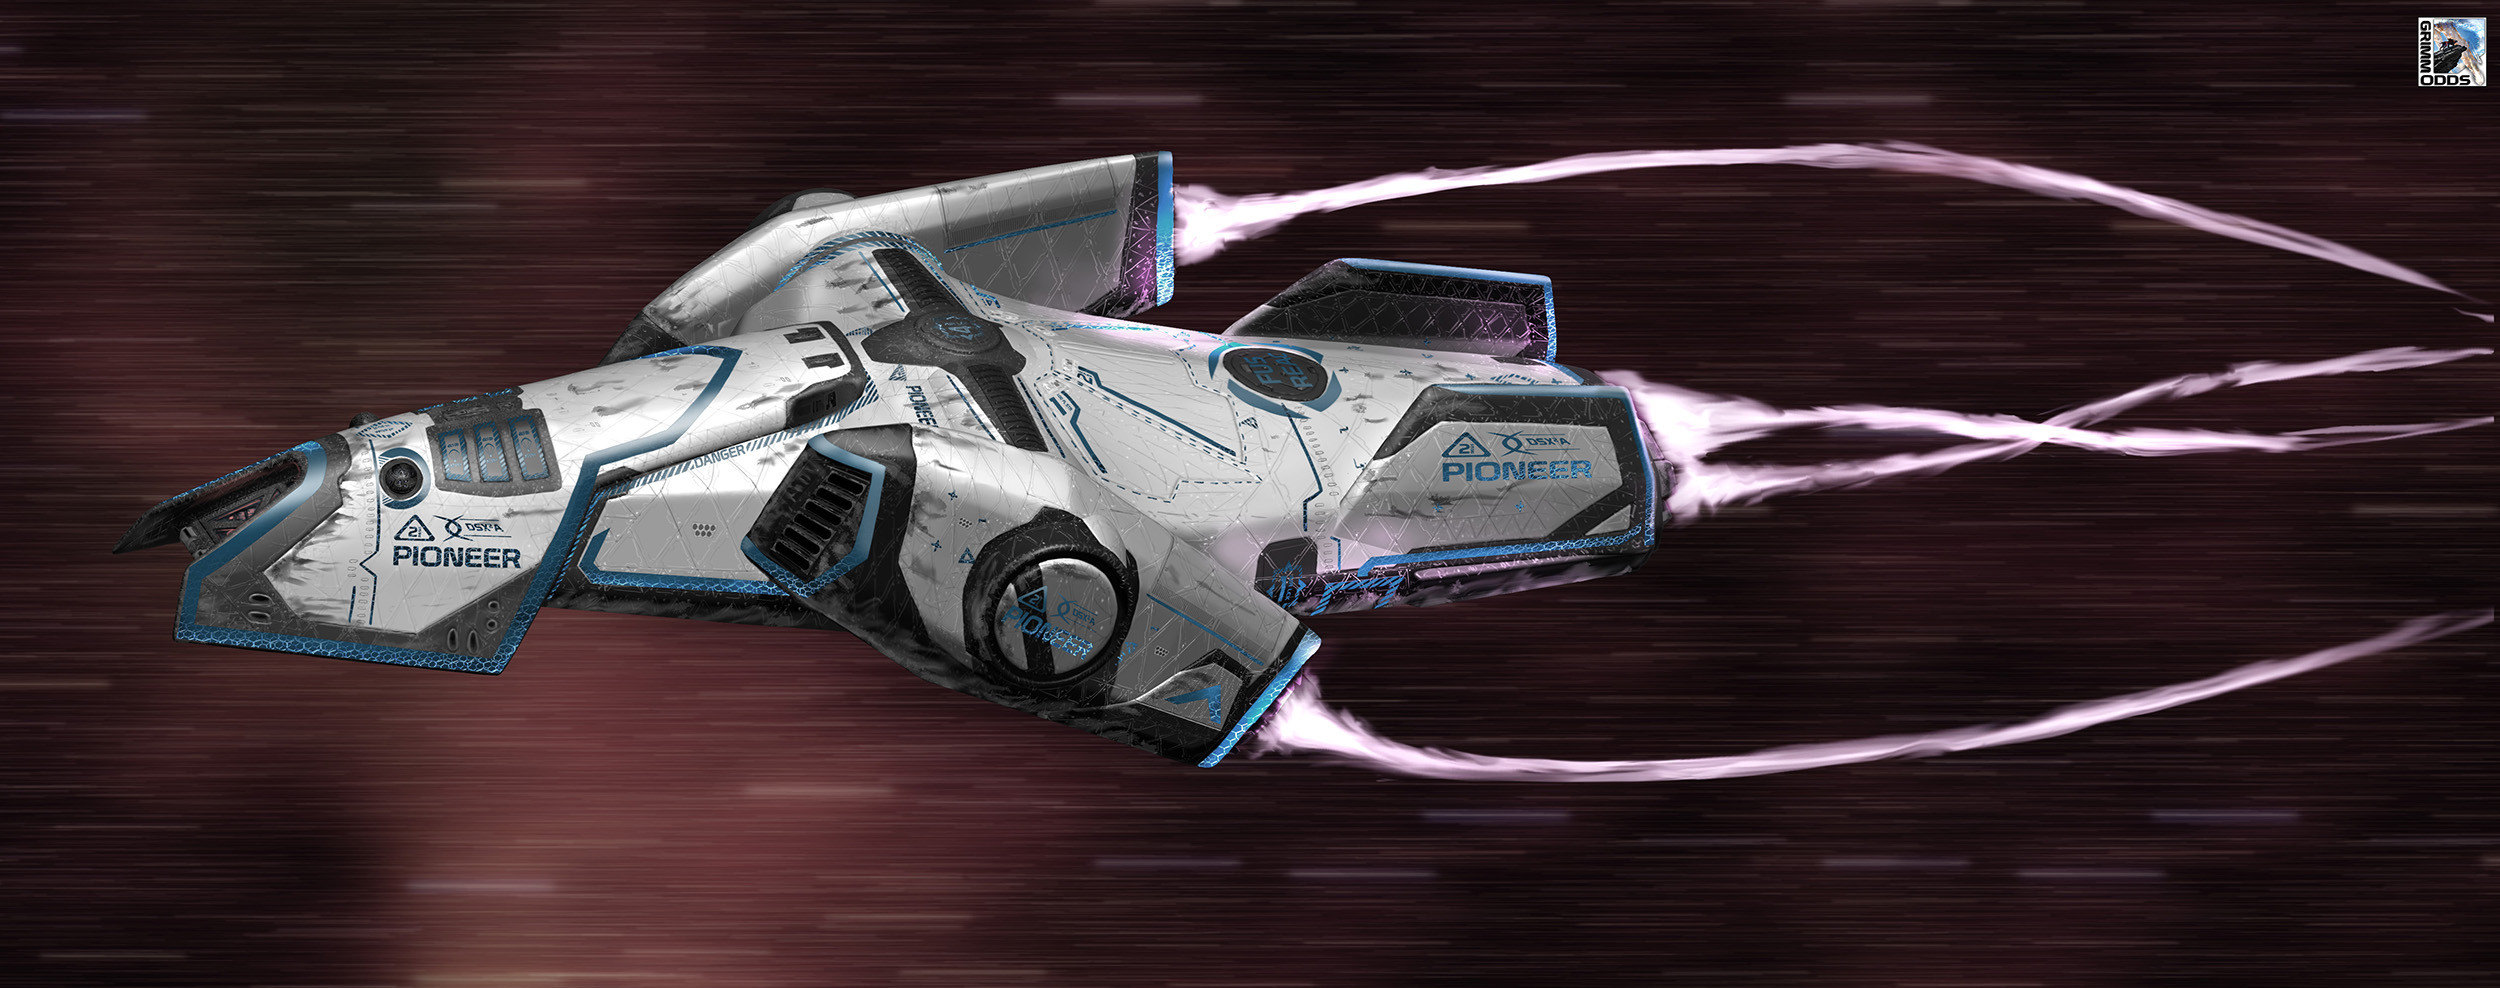 Grimm Odds - Shuttle Turn